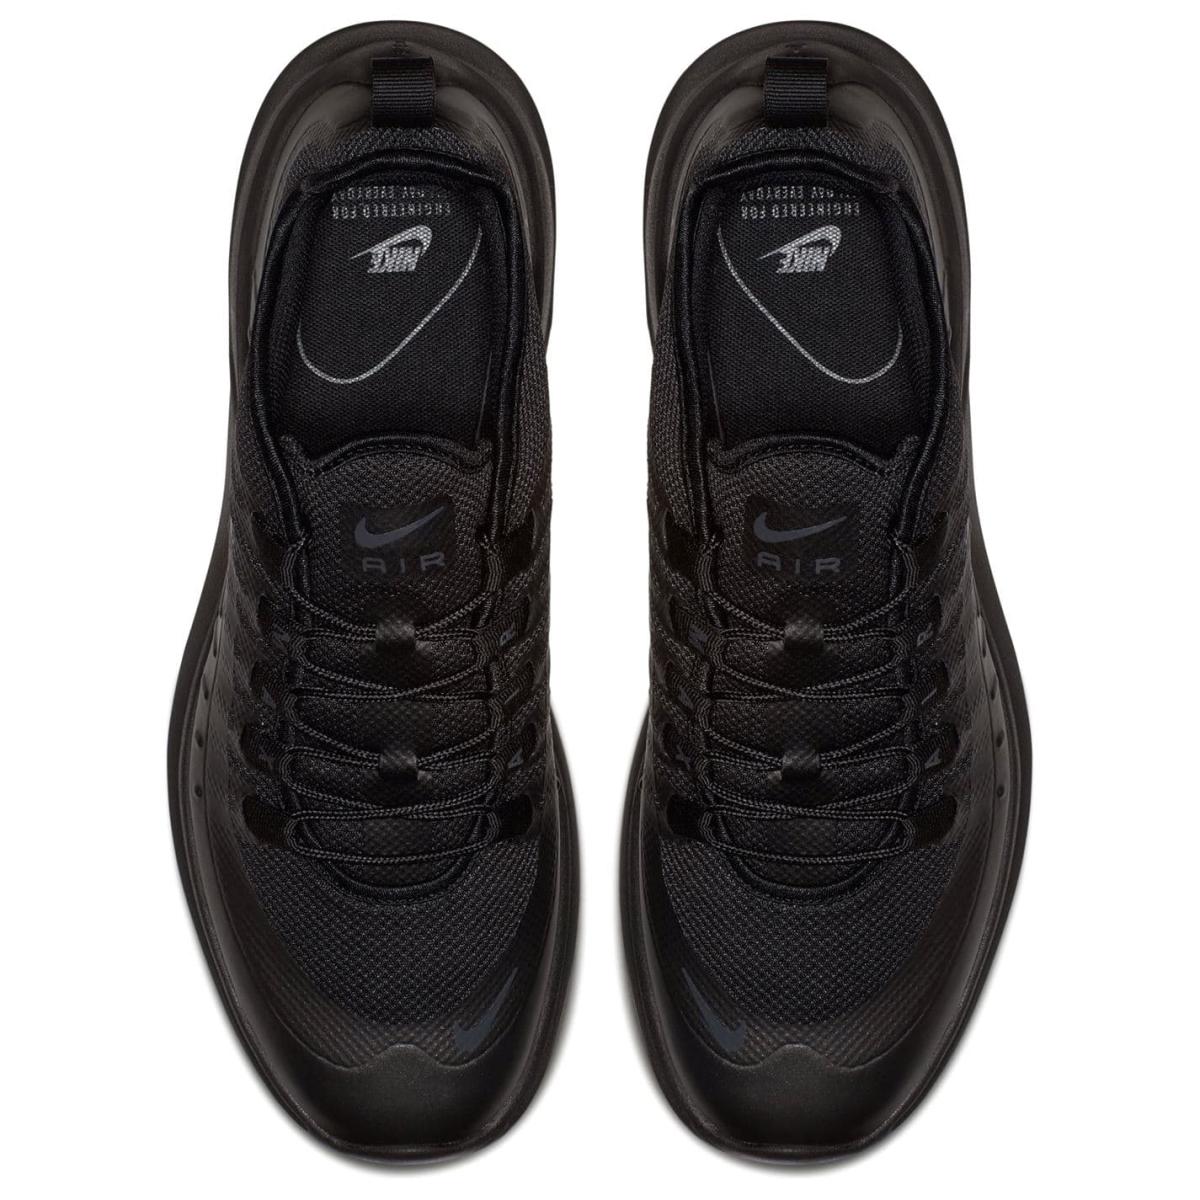 NIKE-Air-Max-Axis-Scarpe-da-ginnastica-Scarpe-da-Corsa-Uomo-Sneaker-Scarpe-Sportive-Fitness-1313 miniatura 13